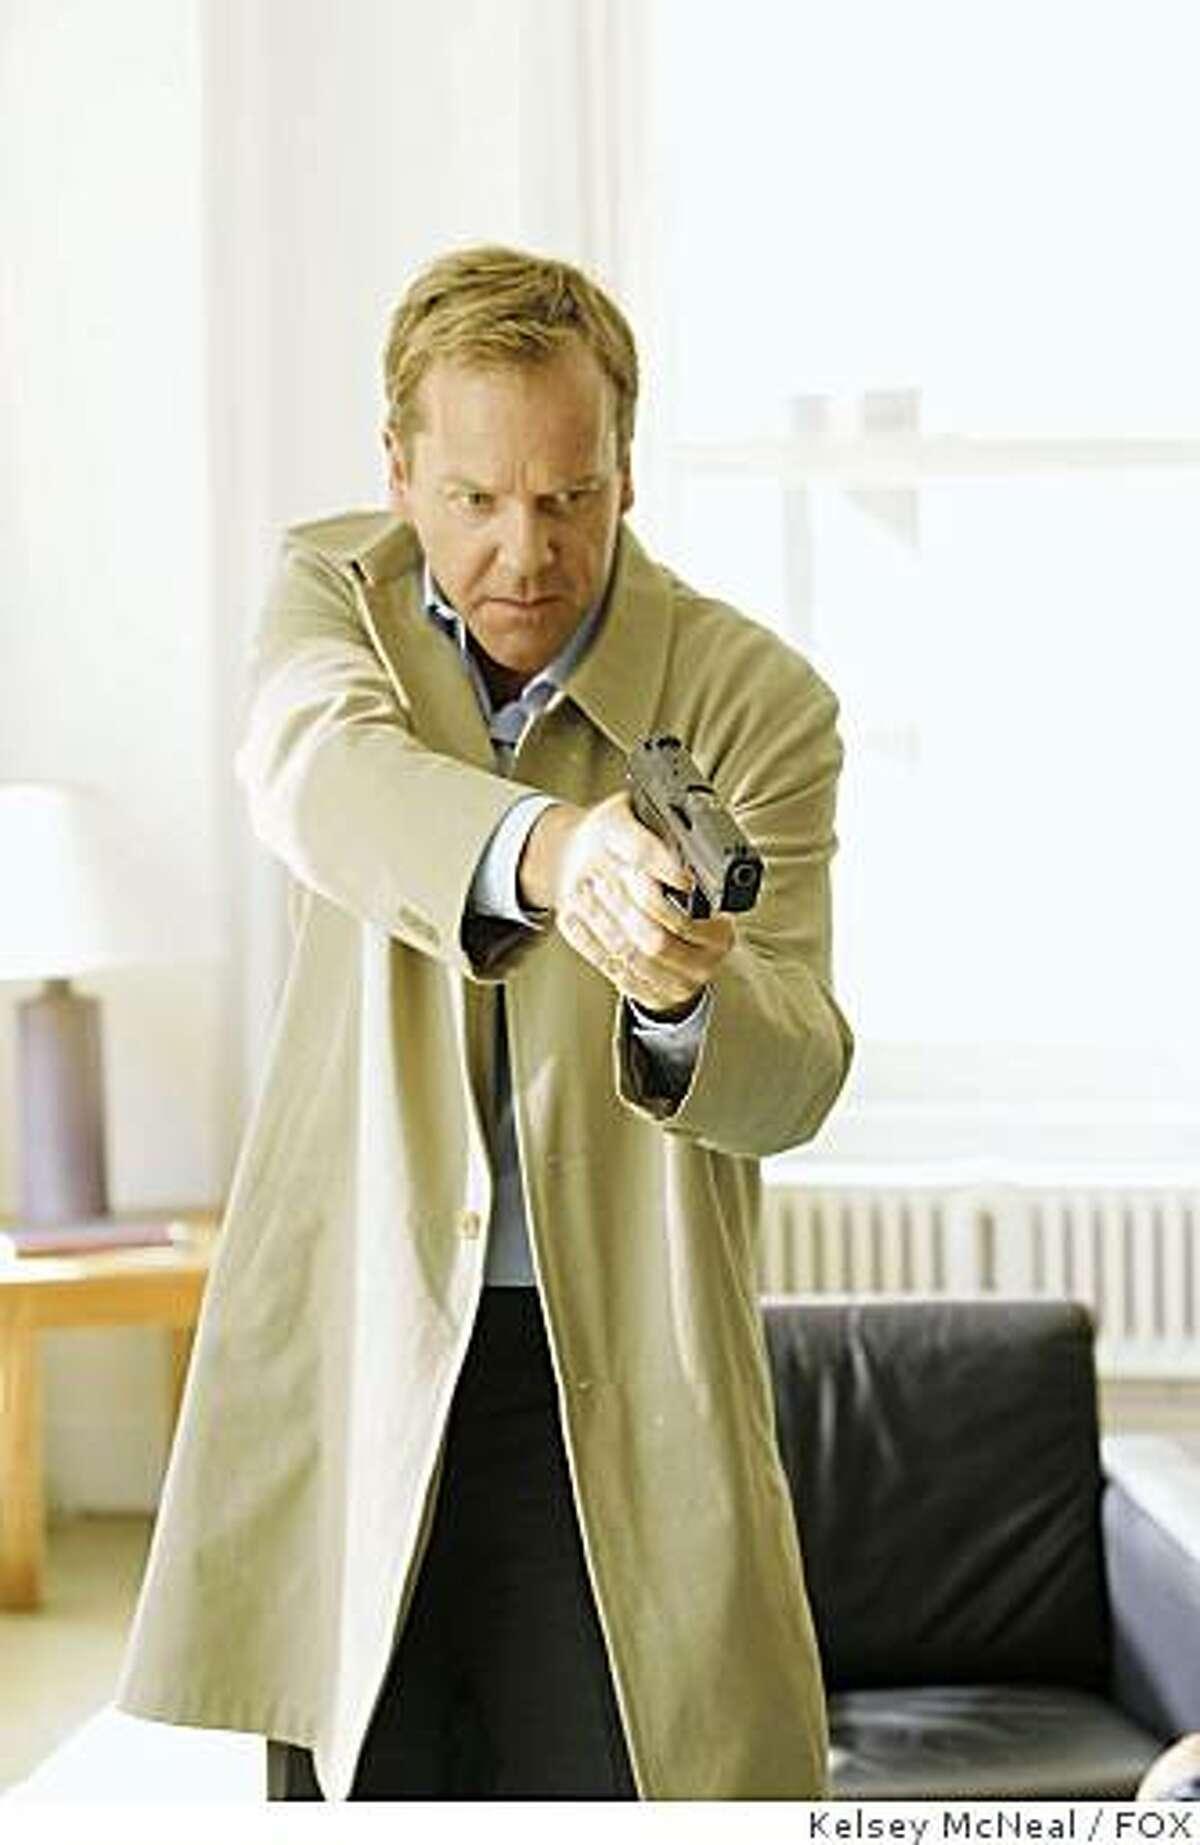 24: Kiefer Sutherland as Jack Bauer in Season Seven of 24 on FOX.